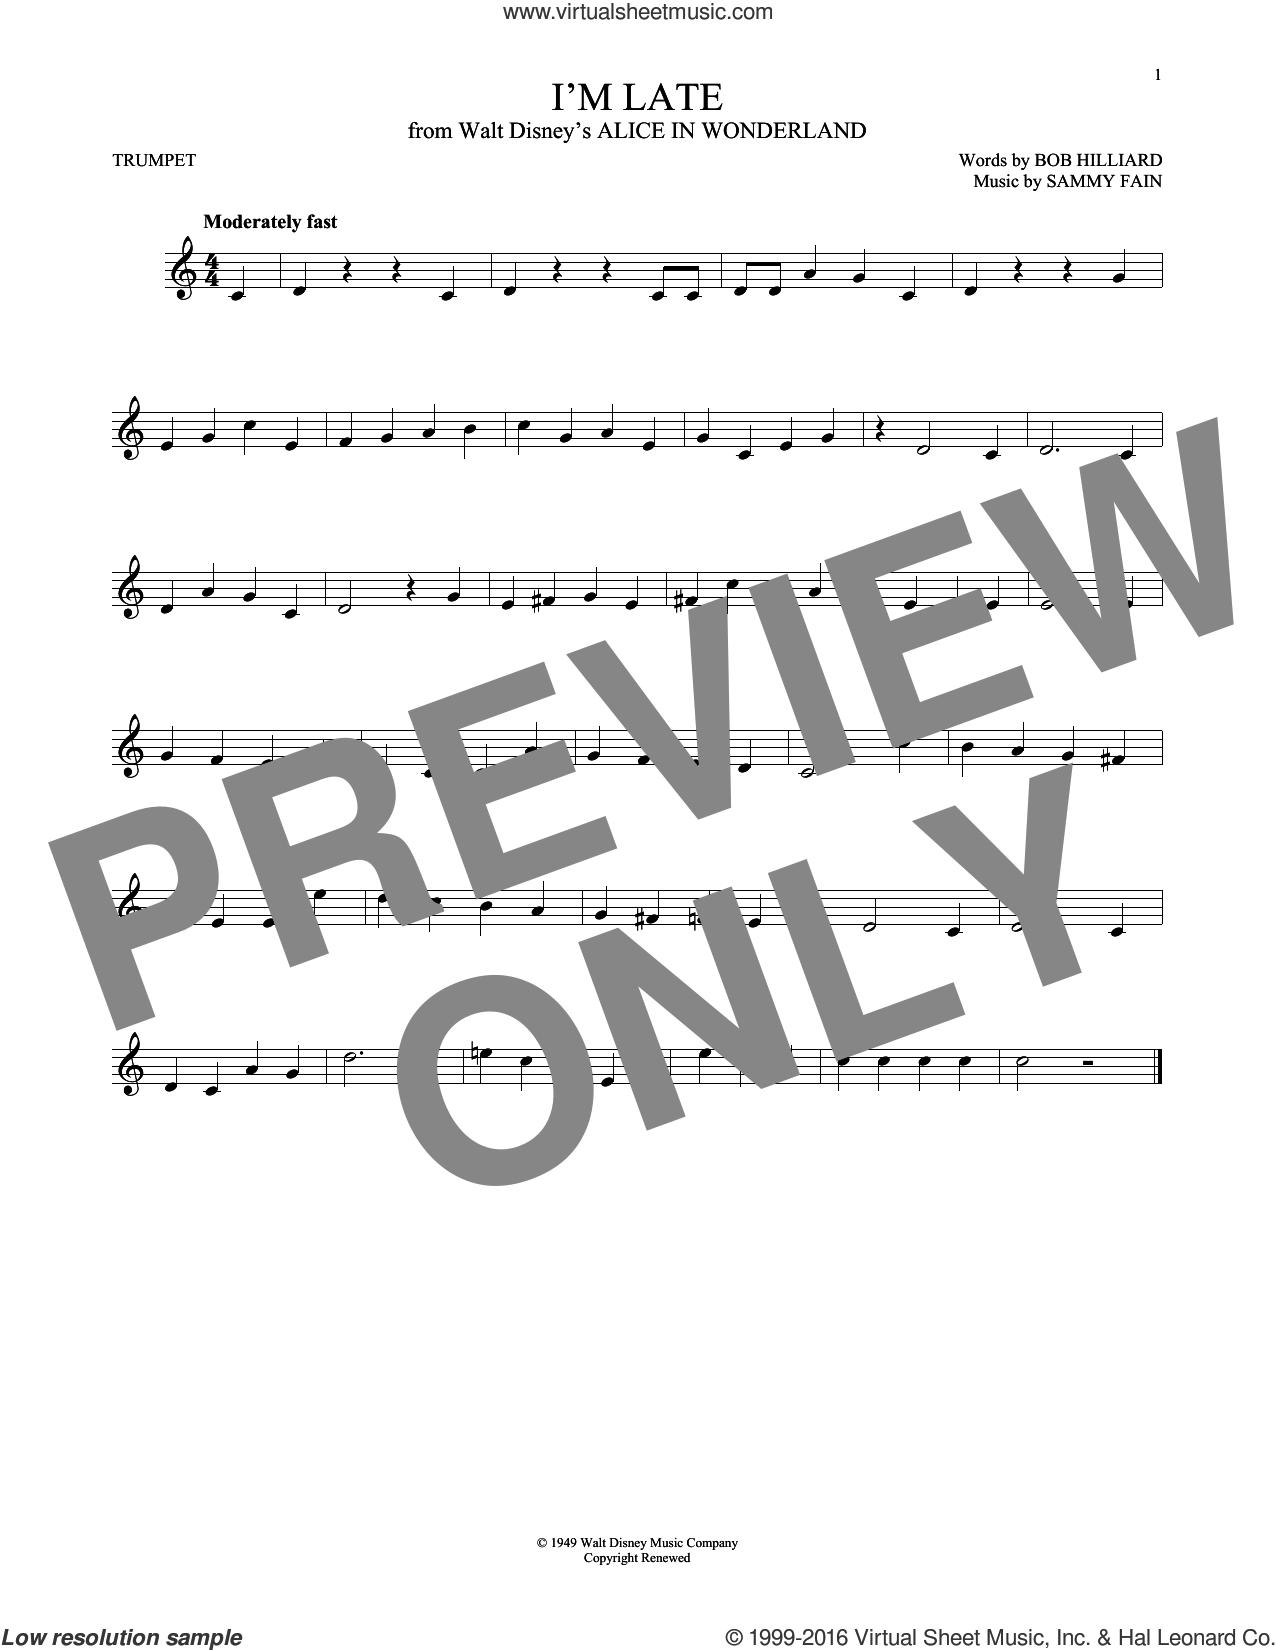 I'm Late sheet music for trumpet solo by Sammy Fain and Bob Hilliard, intermediate skill level